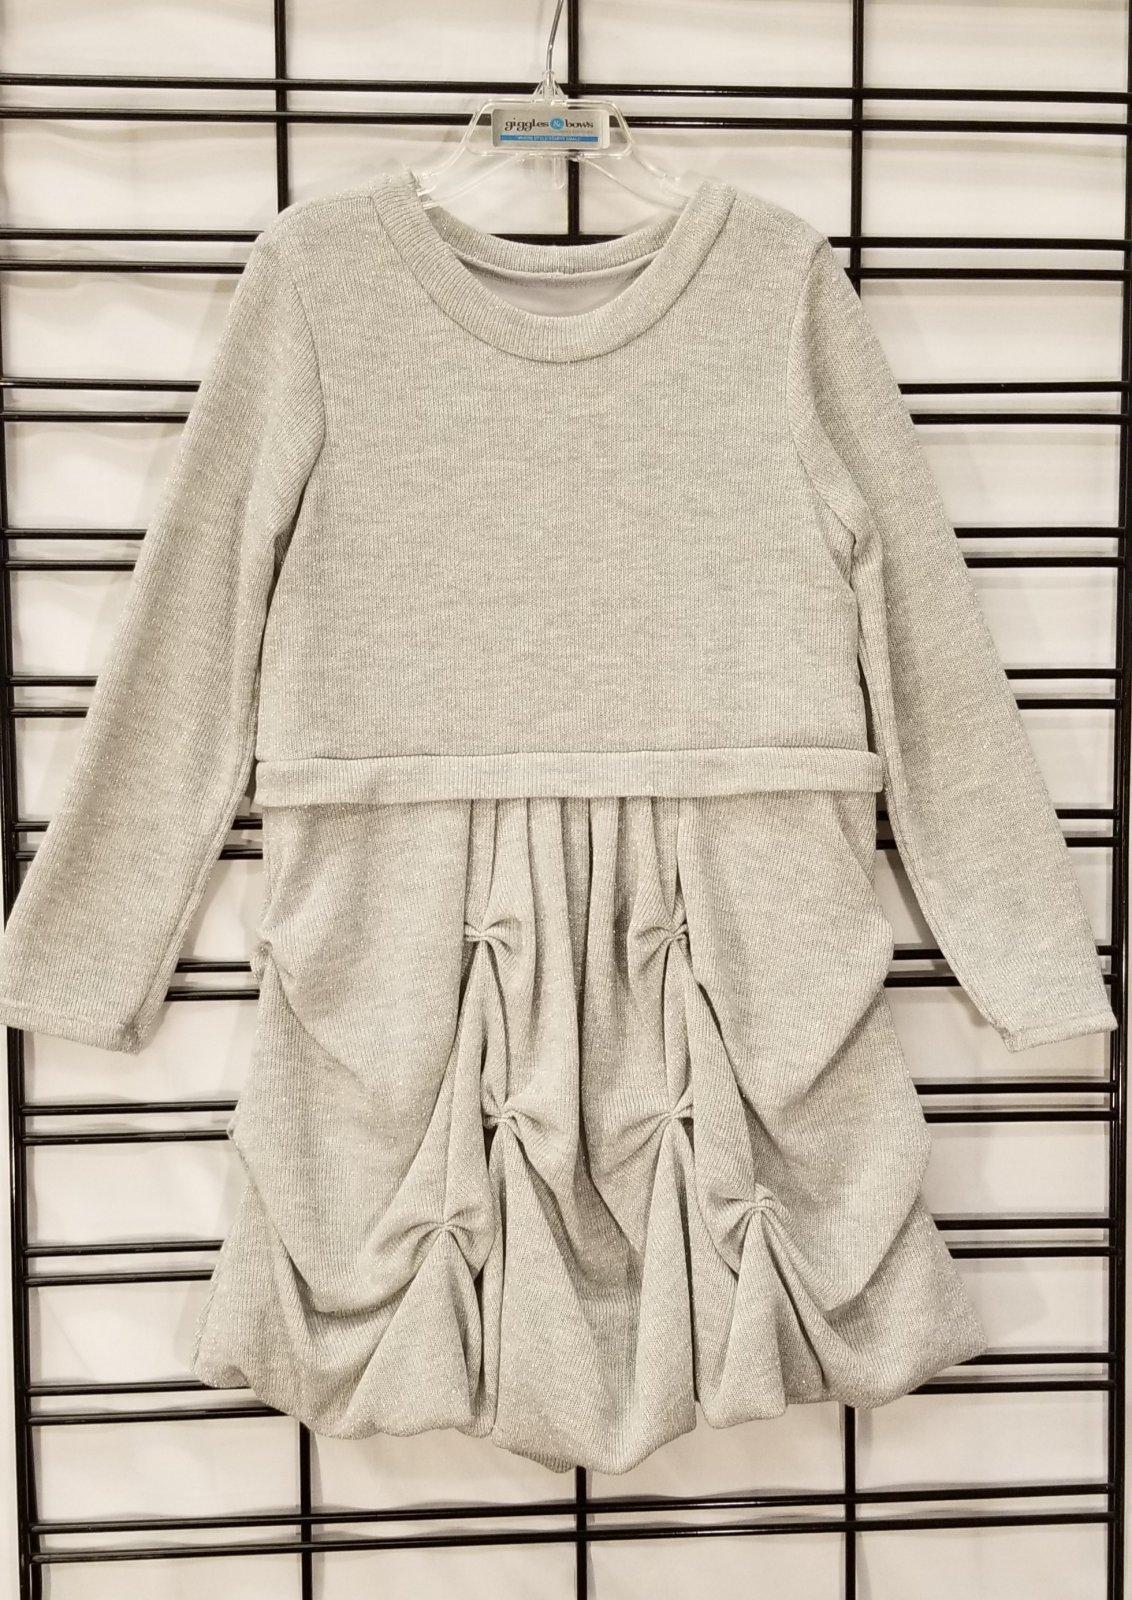 ISOBELLA & CHLOE - Silver Sparkle Dress